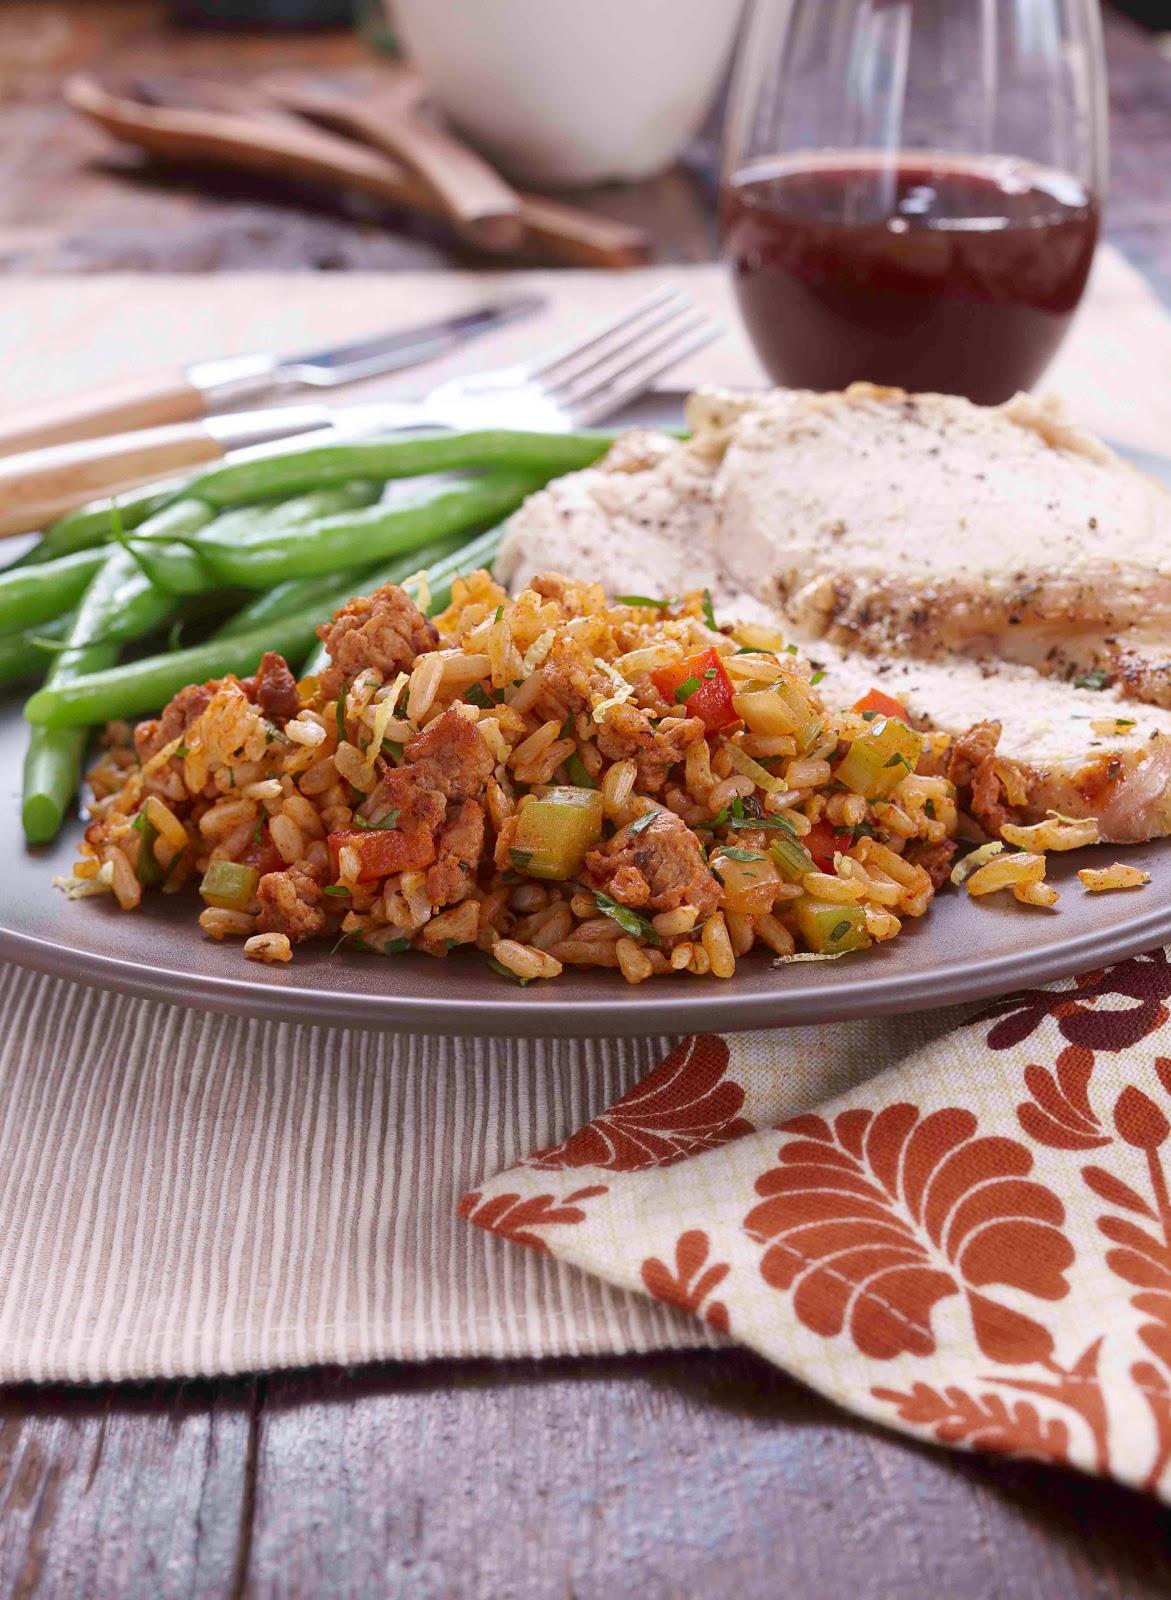 Food Tastes Yummy: CHORIZO, PEPPER AND RICE STUFFING